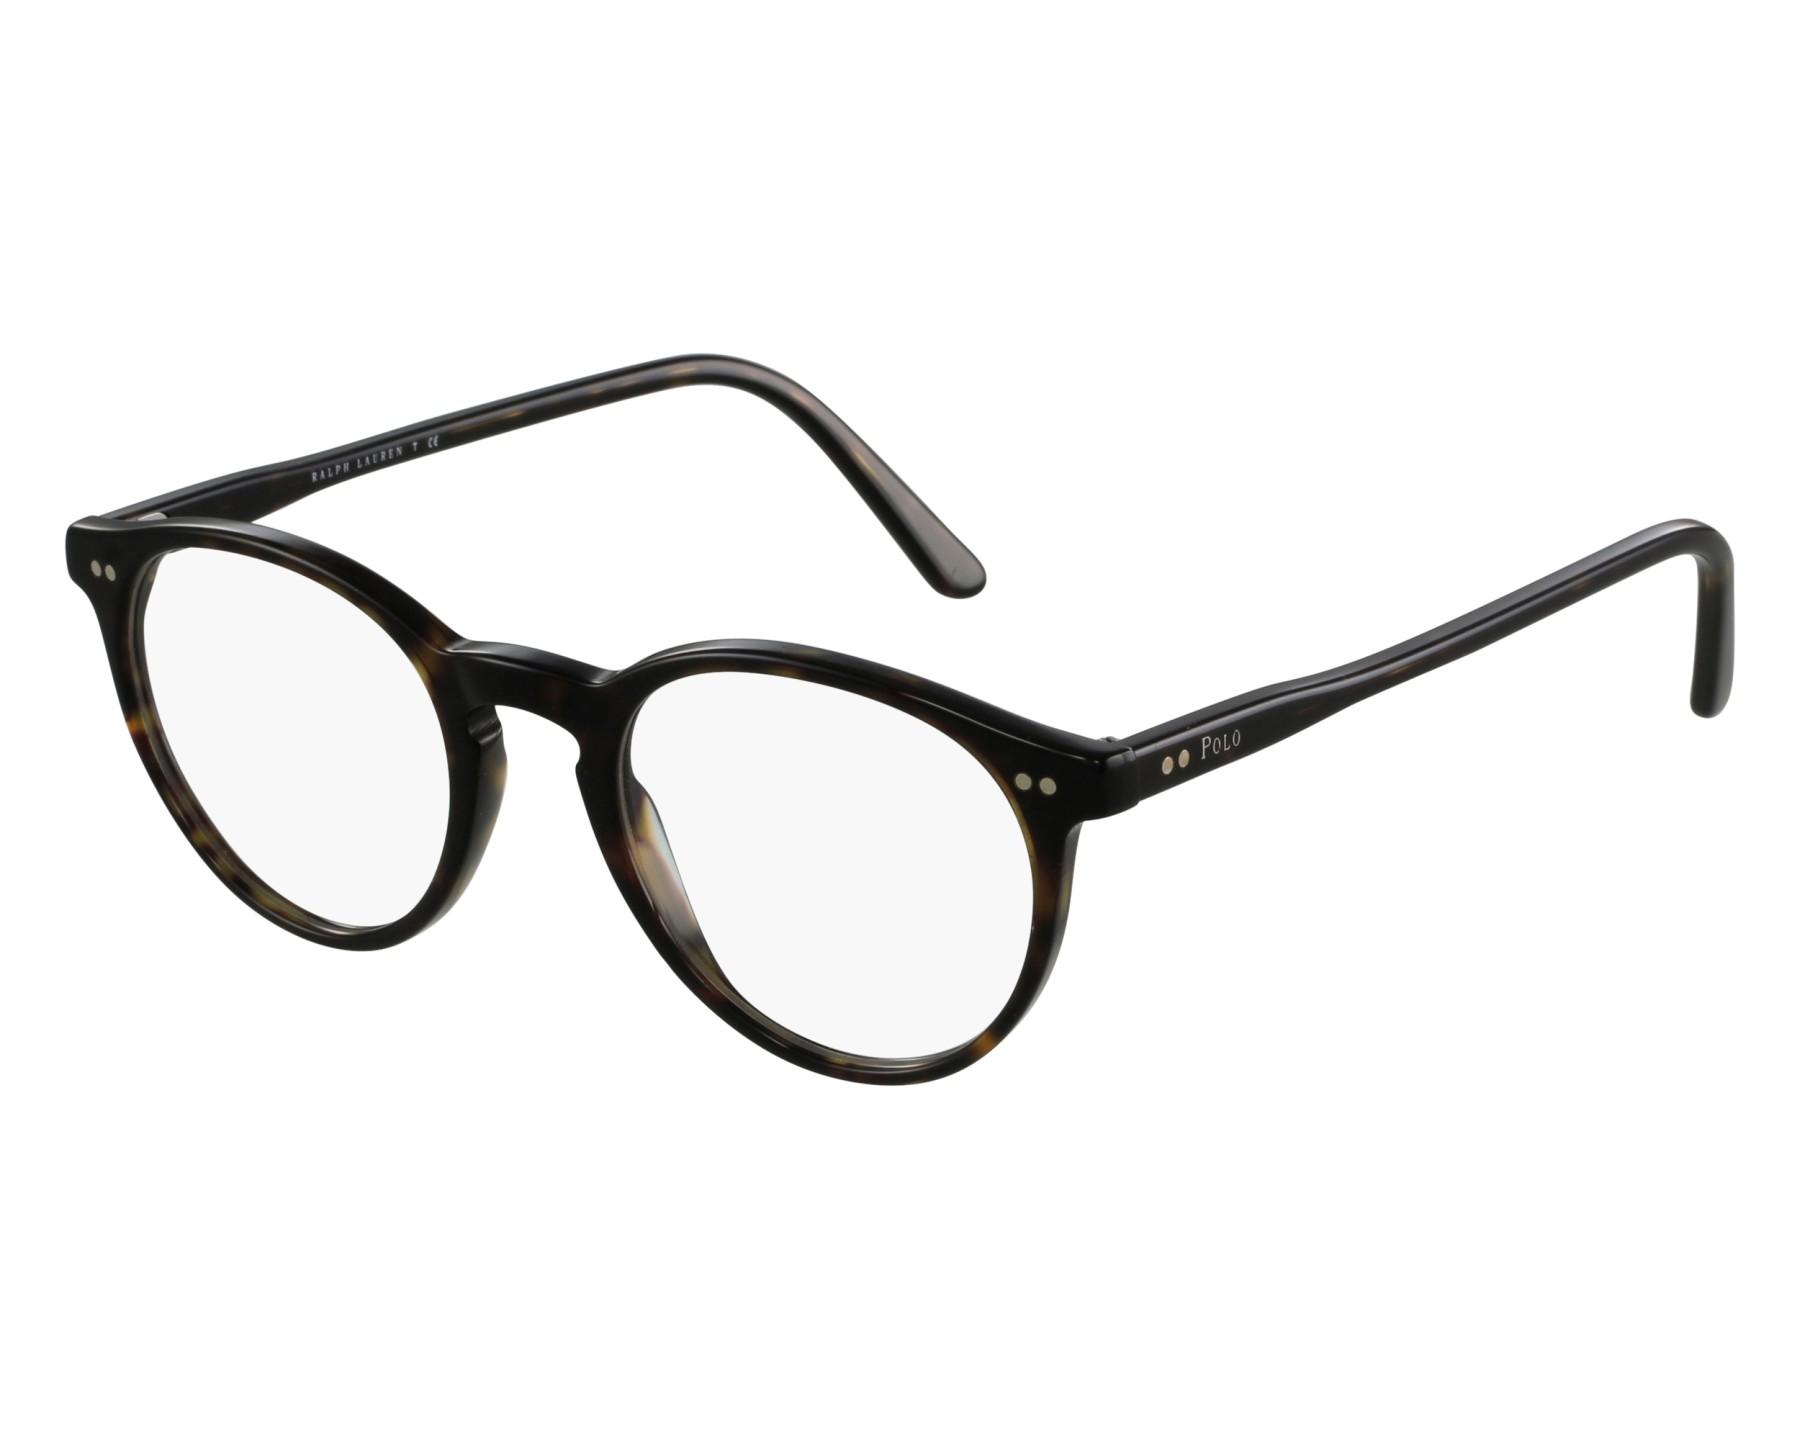 ae4ce94d1e eyeglasses Polo Ralph Lauren PH-2083 5003 48-20 Havana front view